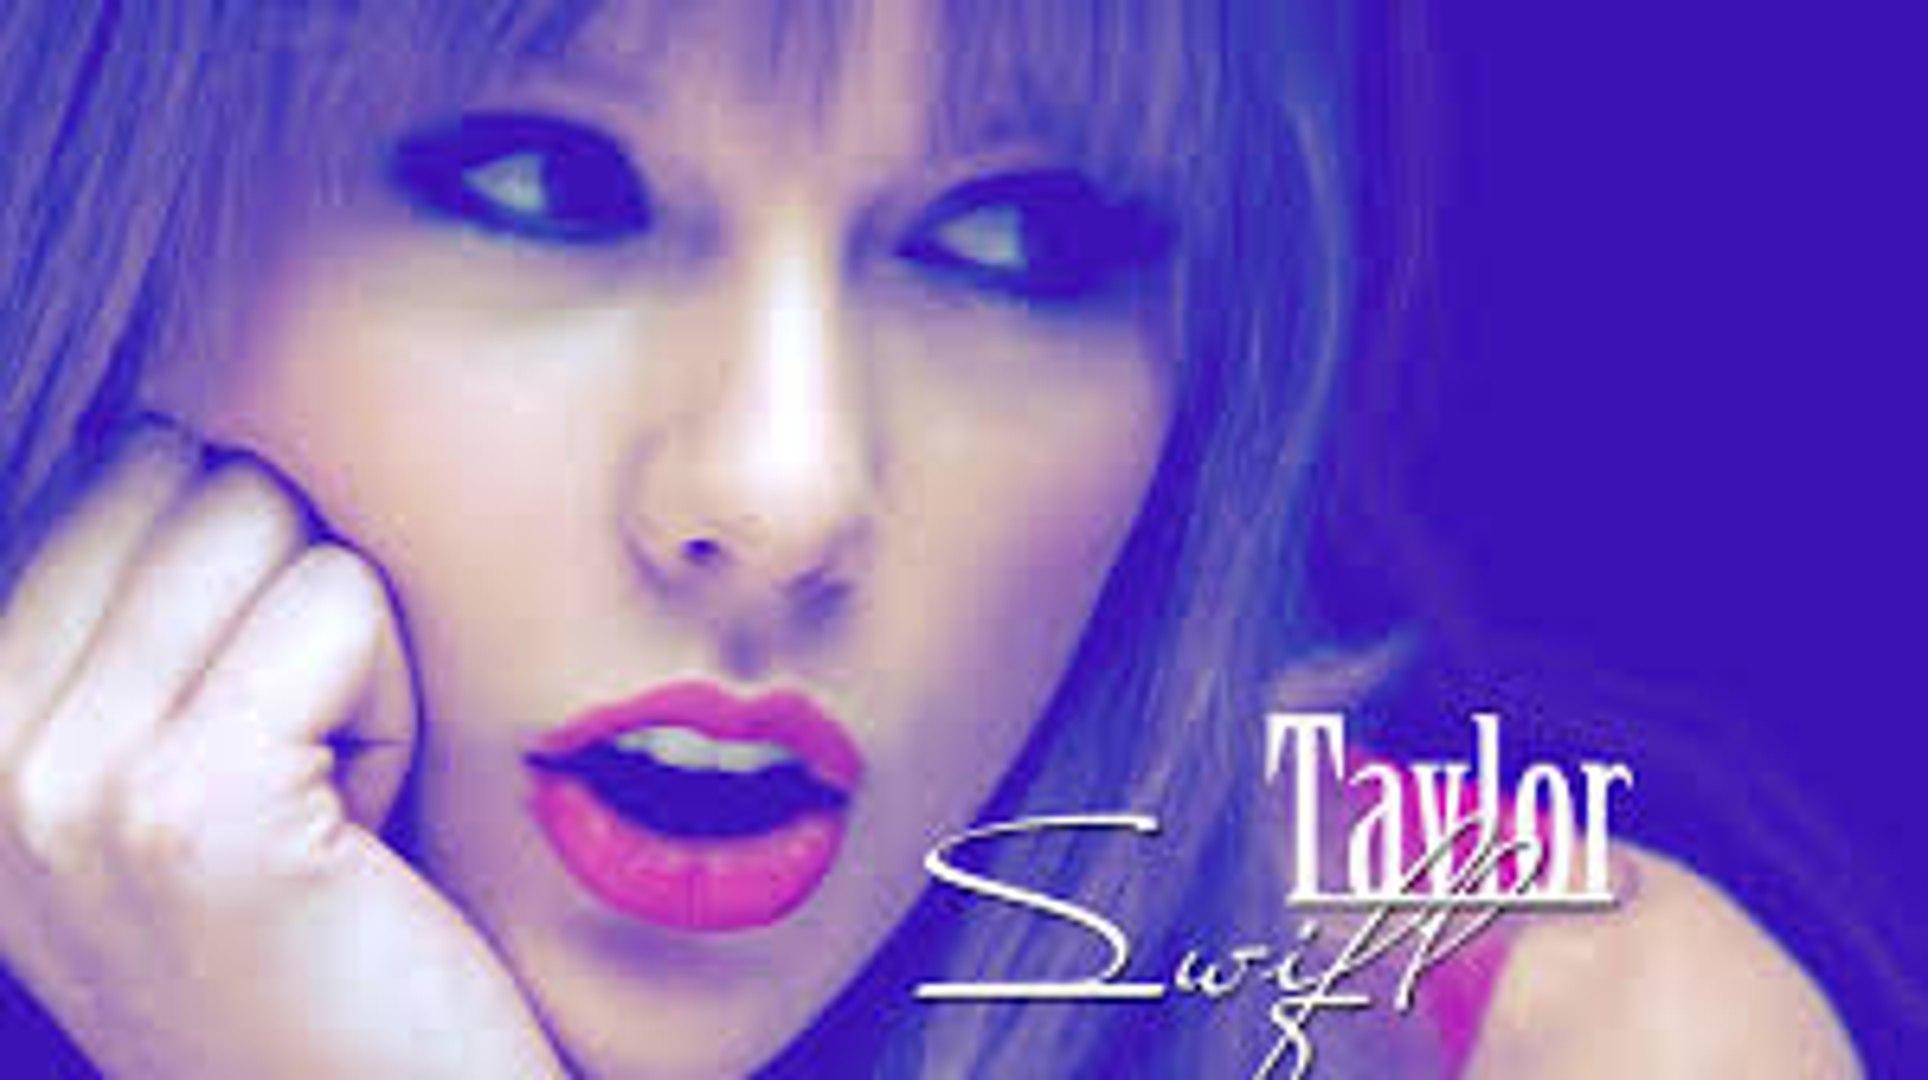 Taylor Swift - Blank Space 2017